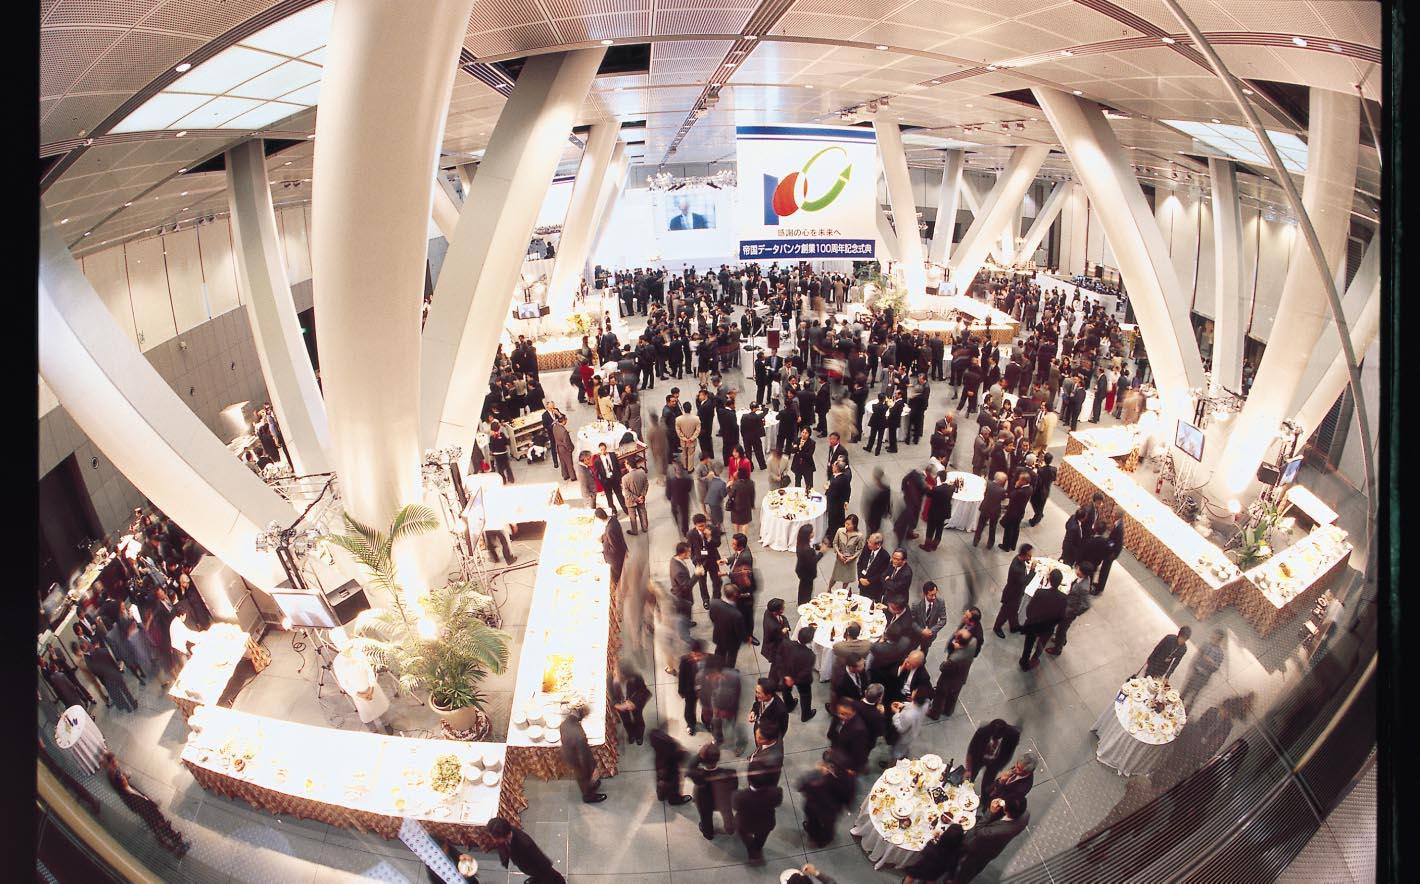 522 創業100周年記念式典会場(東京国際フォーラム、2000年3月4日)